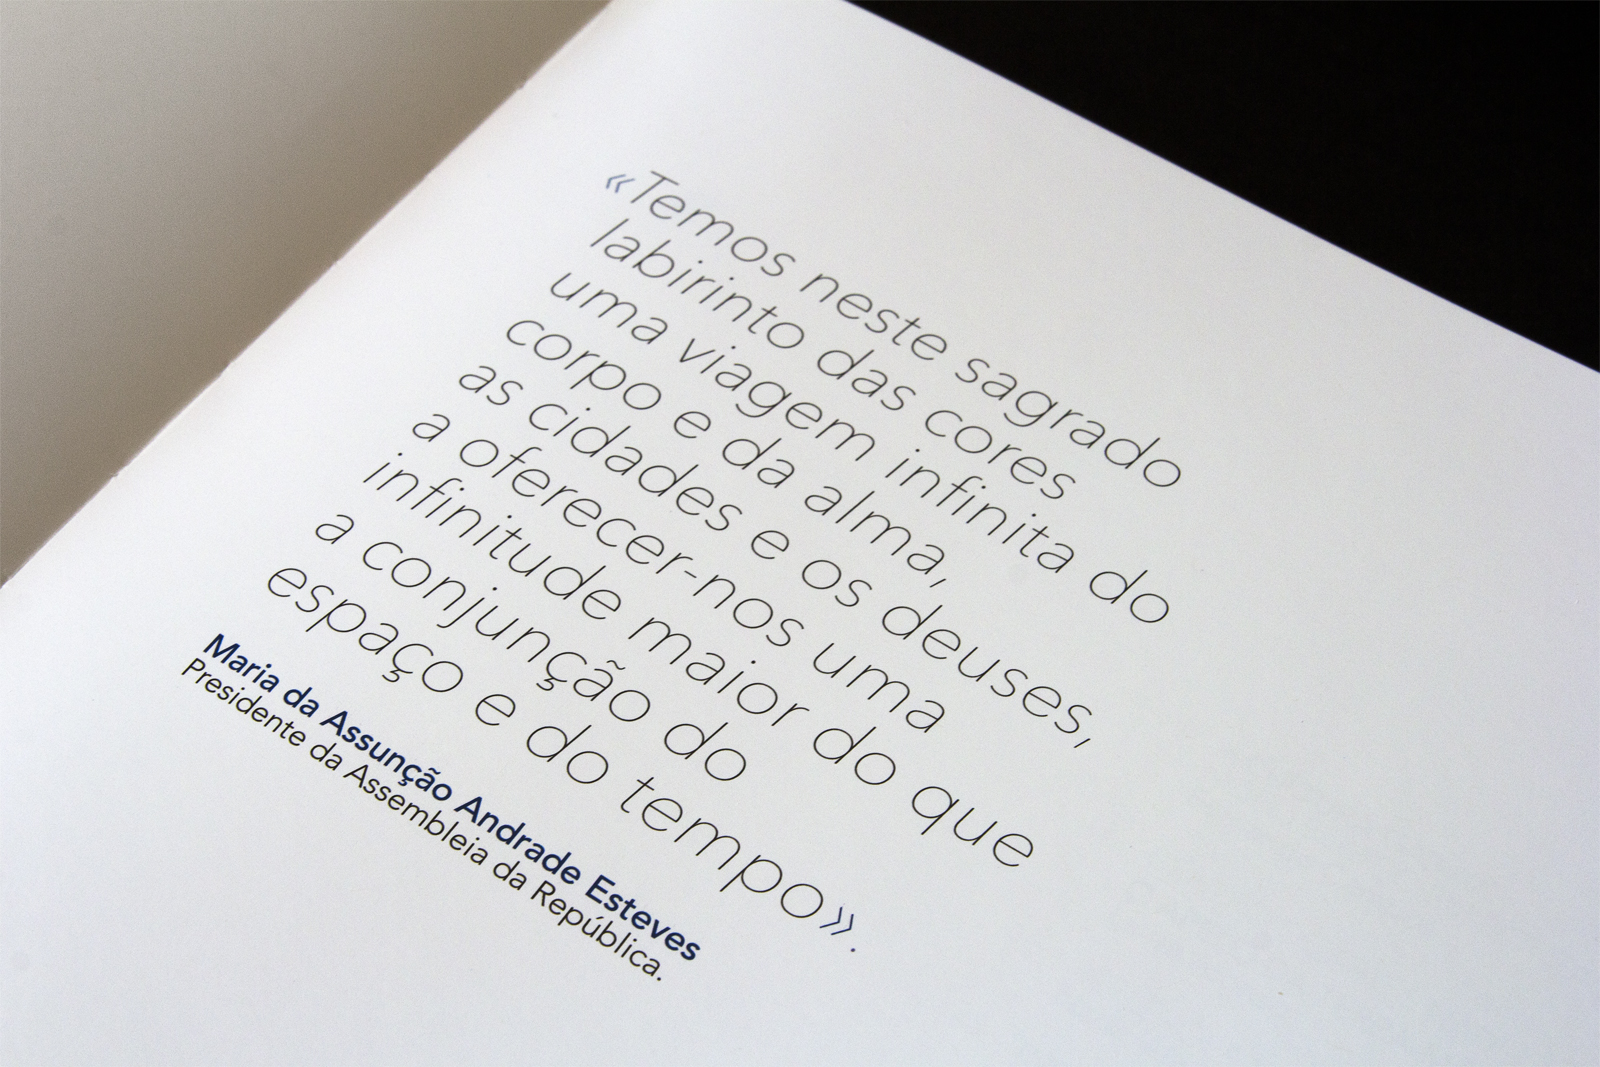 jloisbocos_publicacion_harmonia_002b